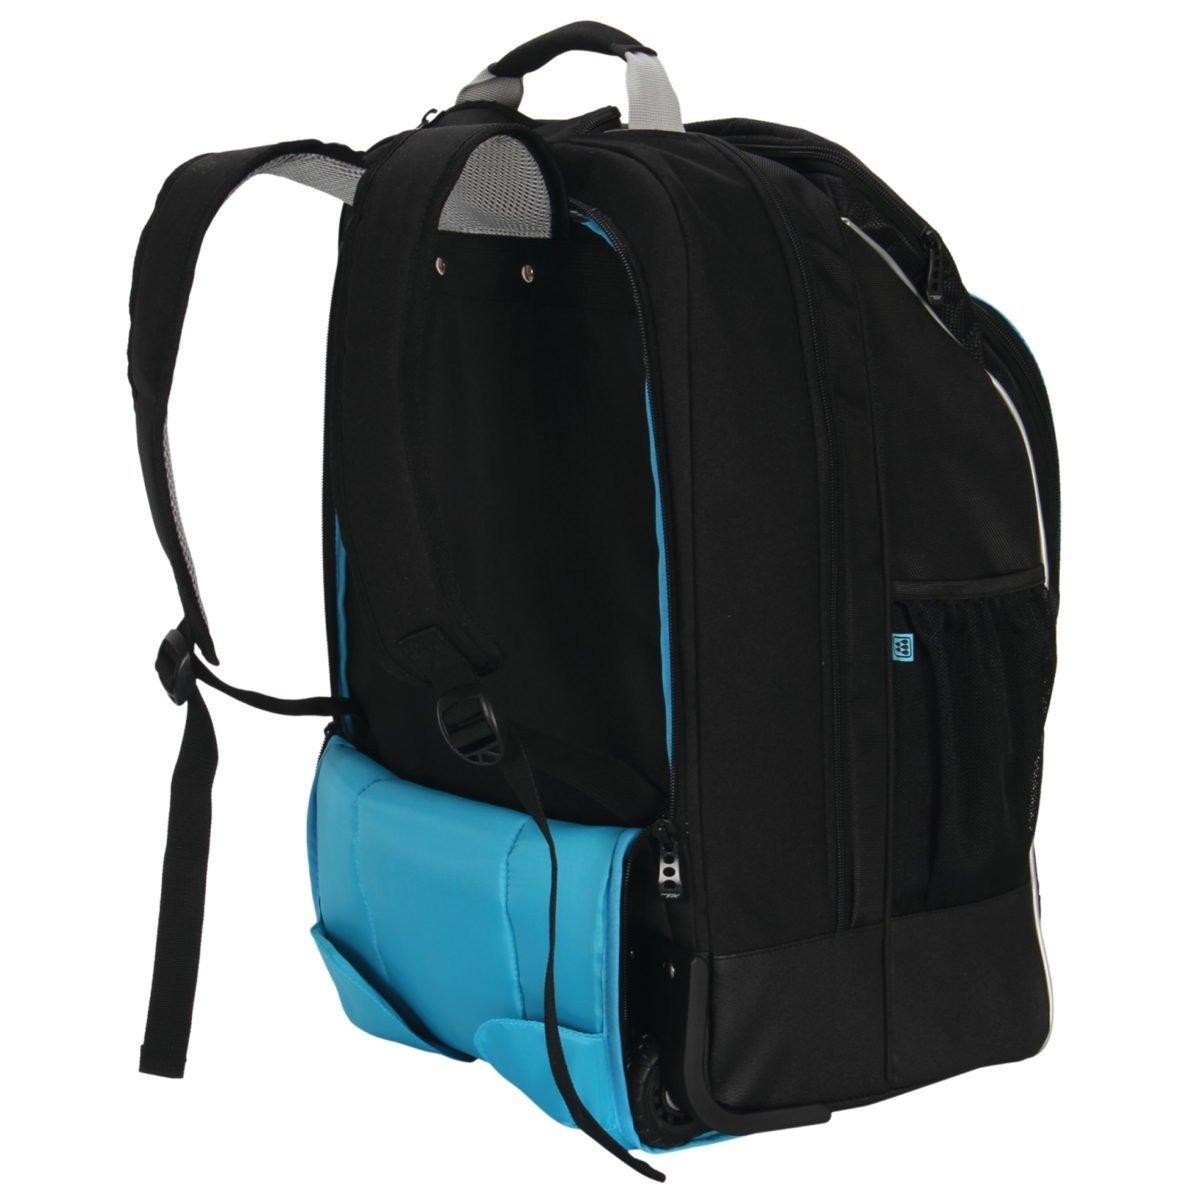 2017/18 TK LCX 1.6 Stick and Kit Bag